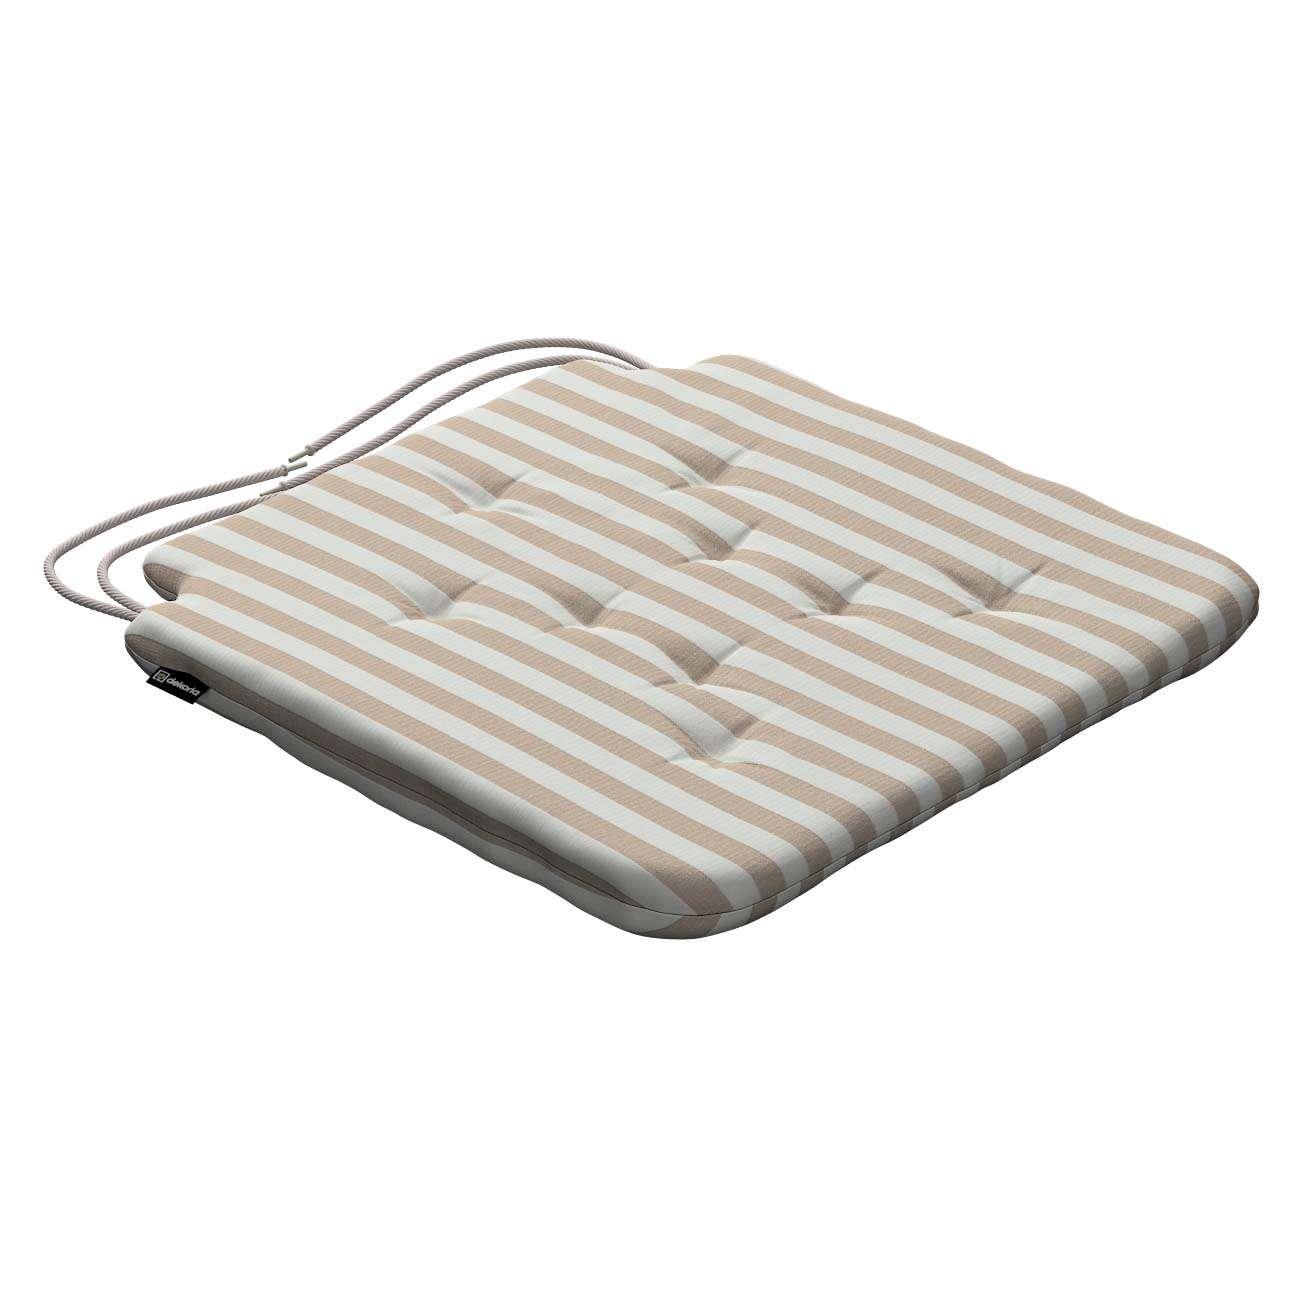 Kėdės pagalvėlė Olek  42 x 41 x 3,5 cm kolekcijoje Quadro, audinys: 136-07